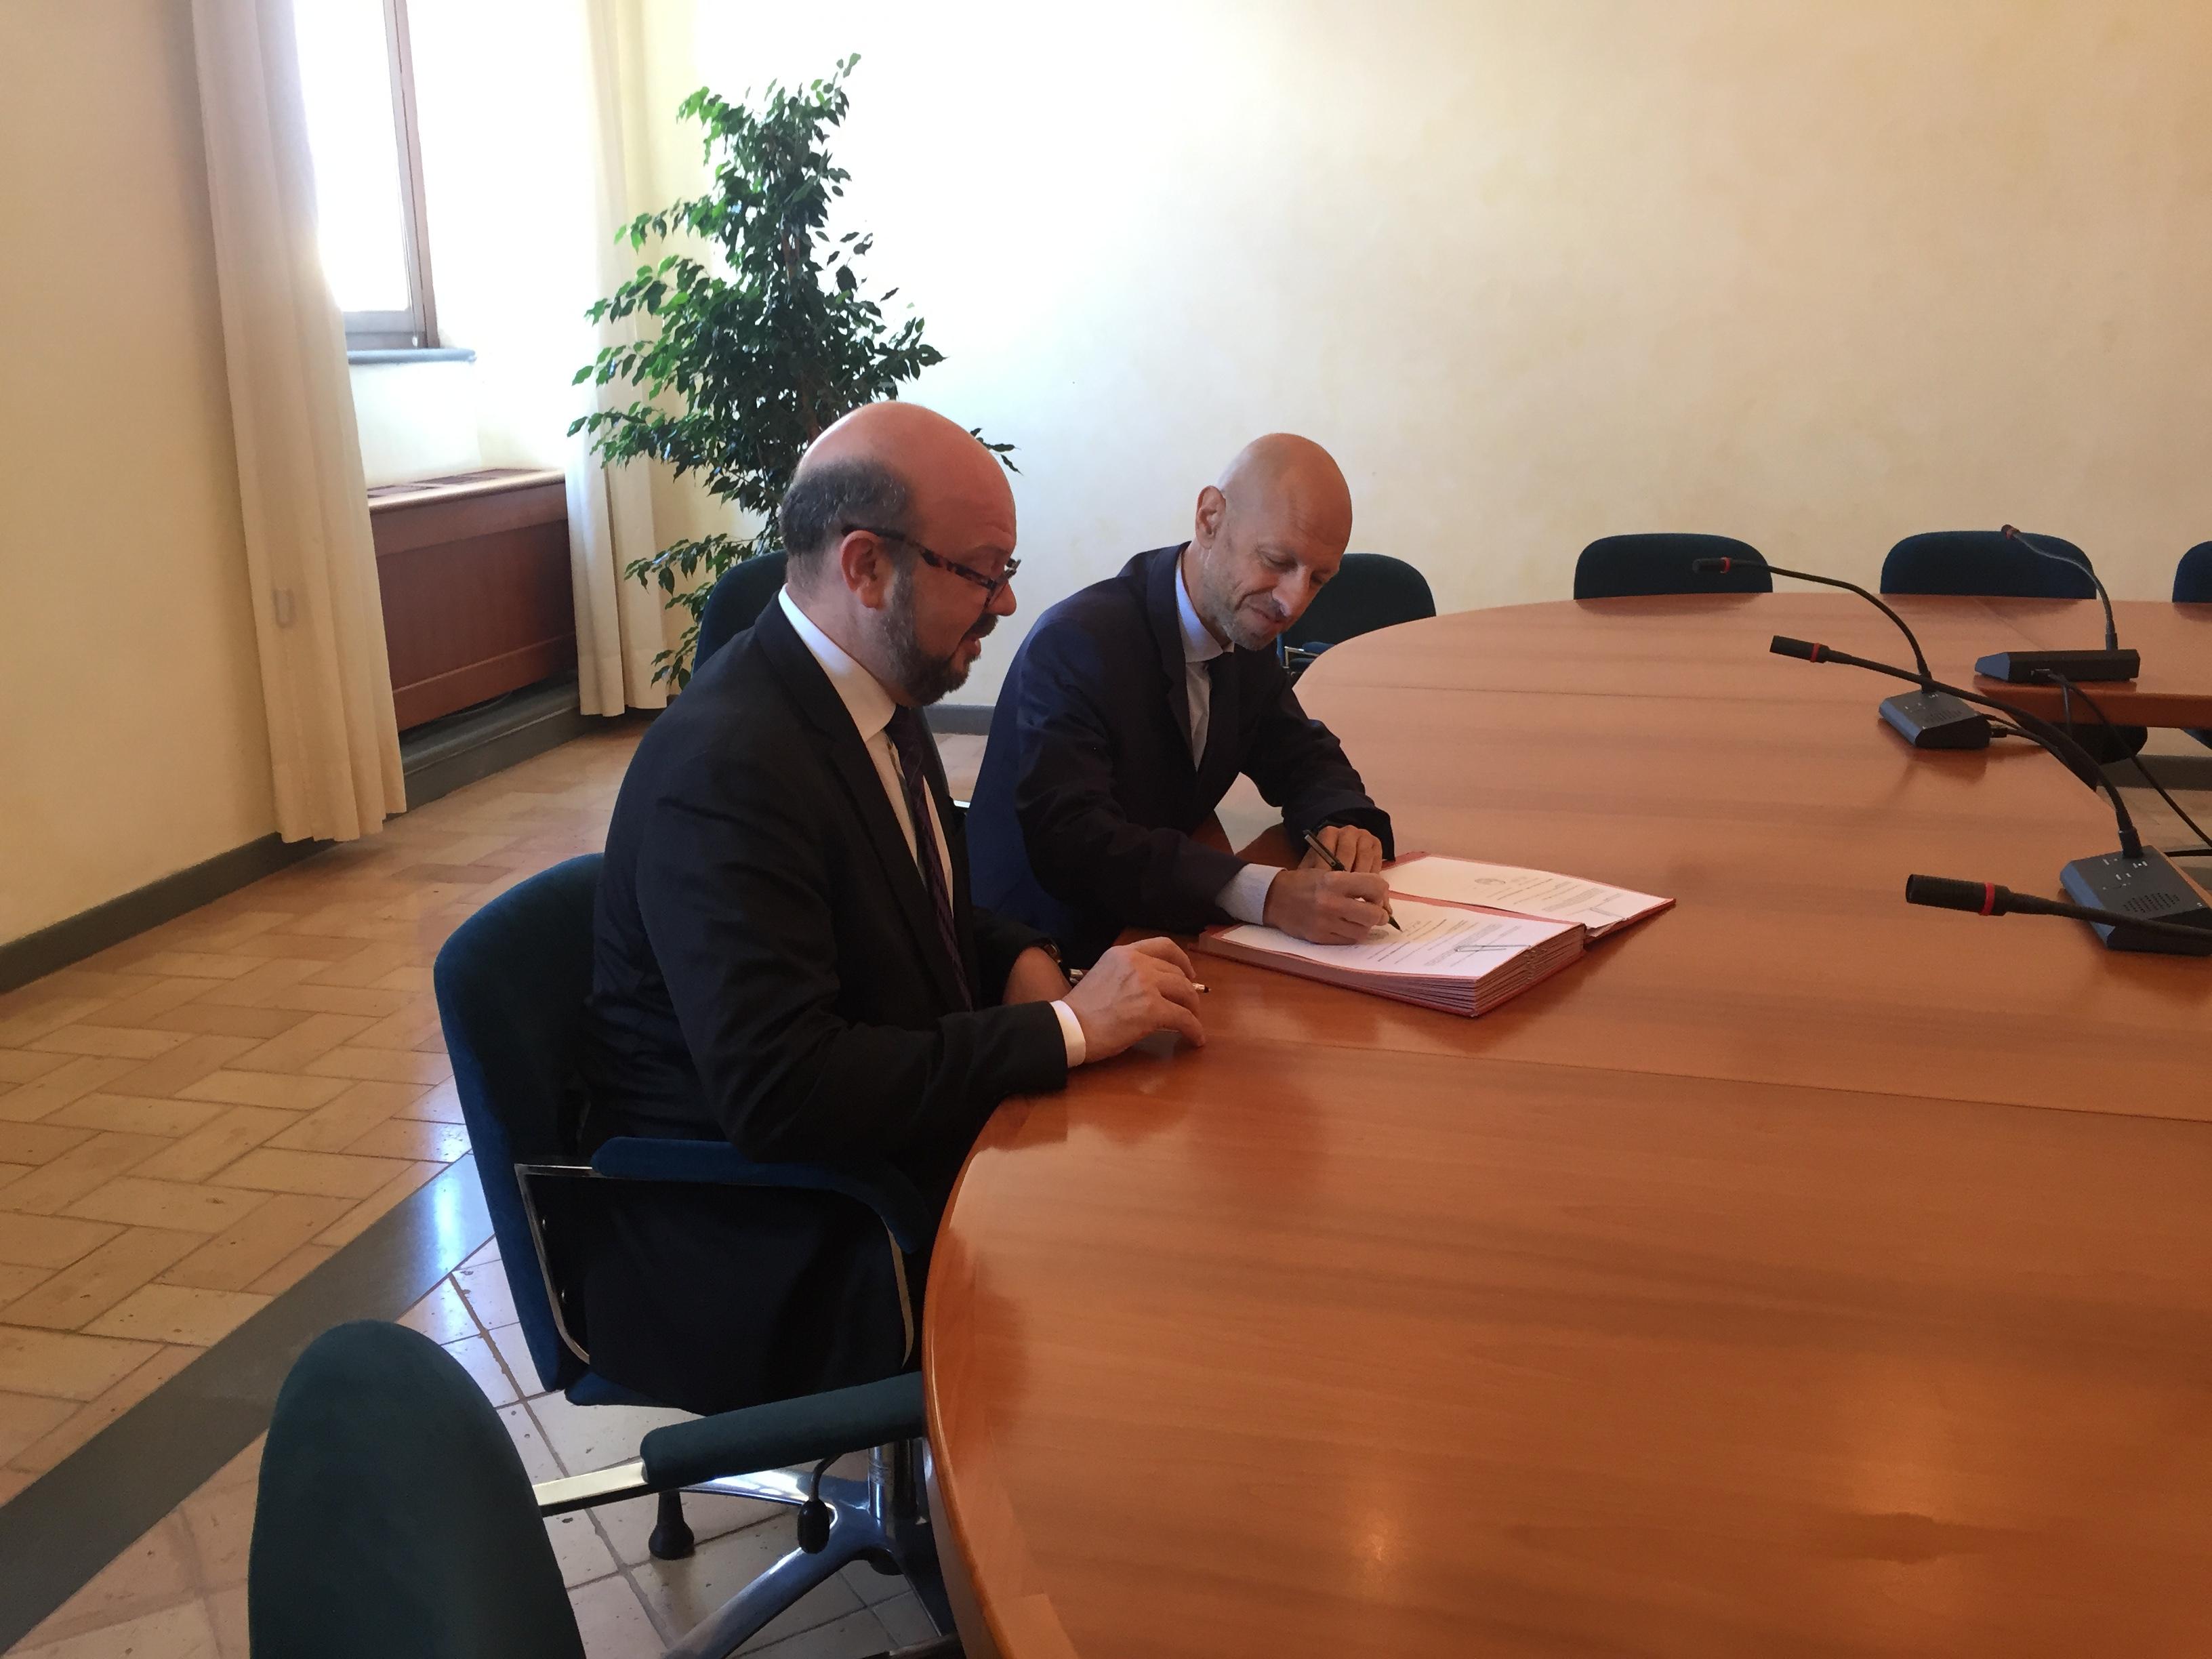 Siglato l'accordo tra l'Unitus di Viterbo  e l'Universidade Federal do Paranà